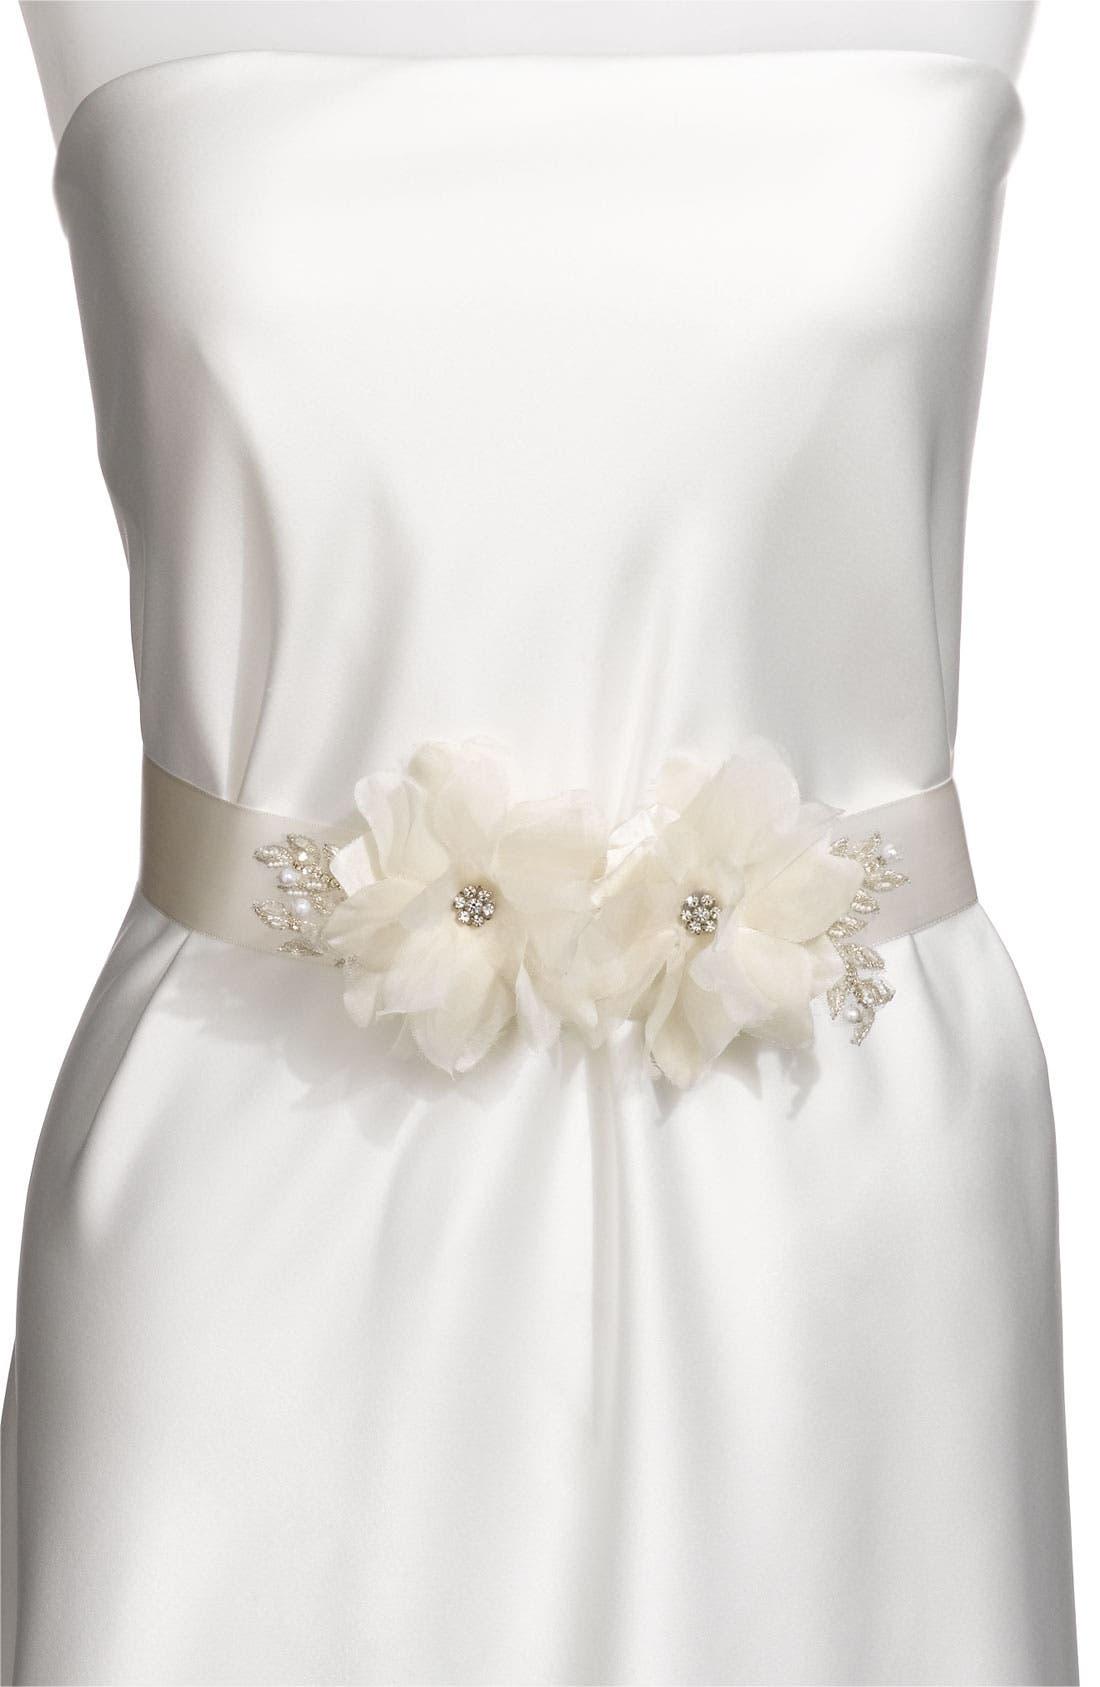 Alternate Image 1 Selected - Nina Satin Sash & Floral Appliqué Pin